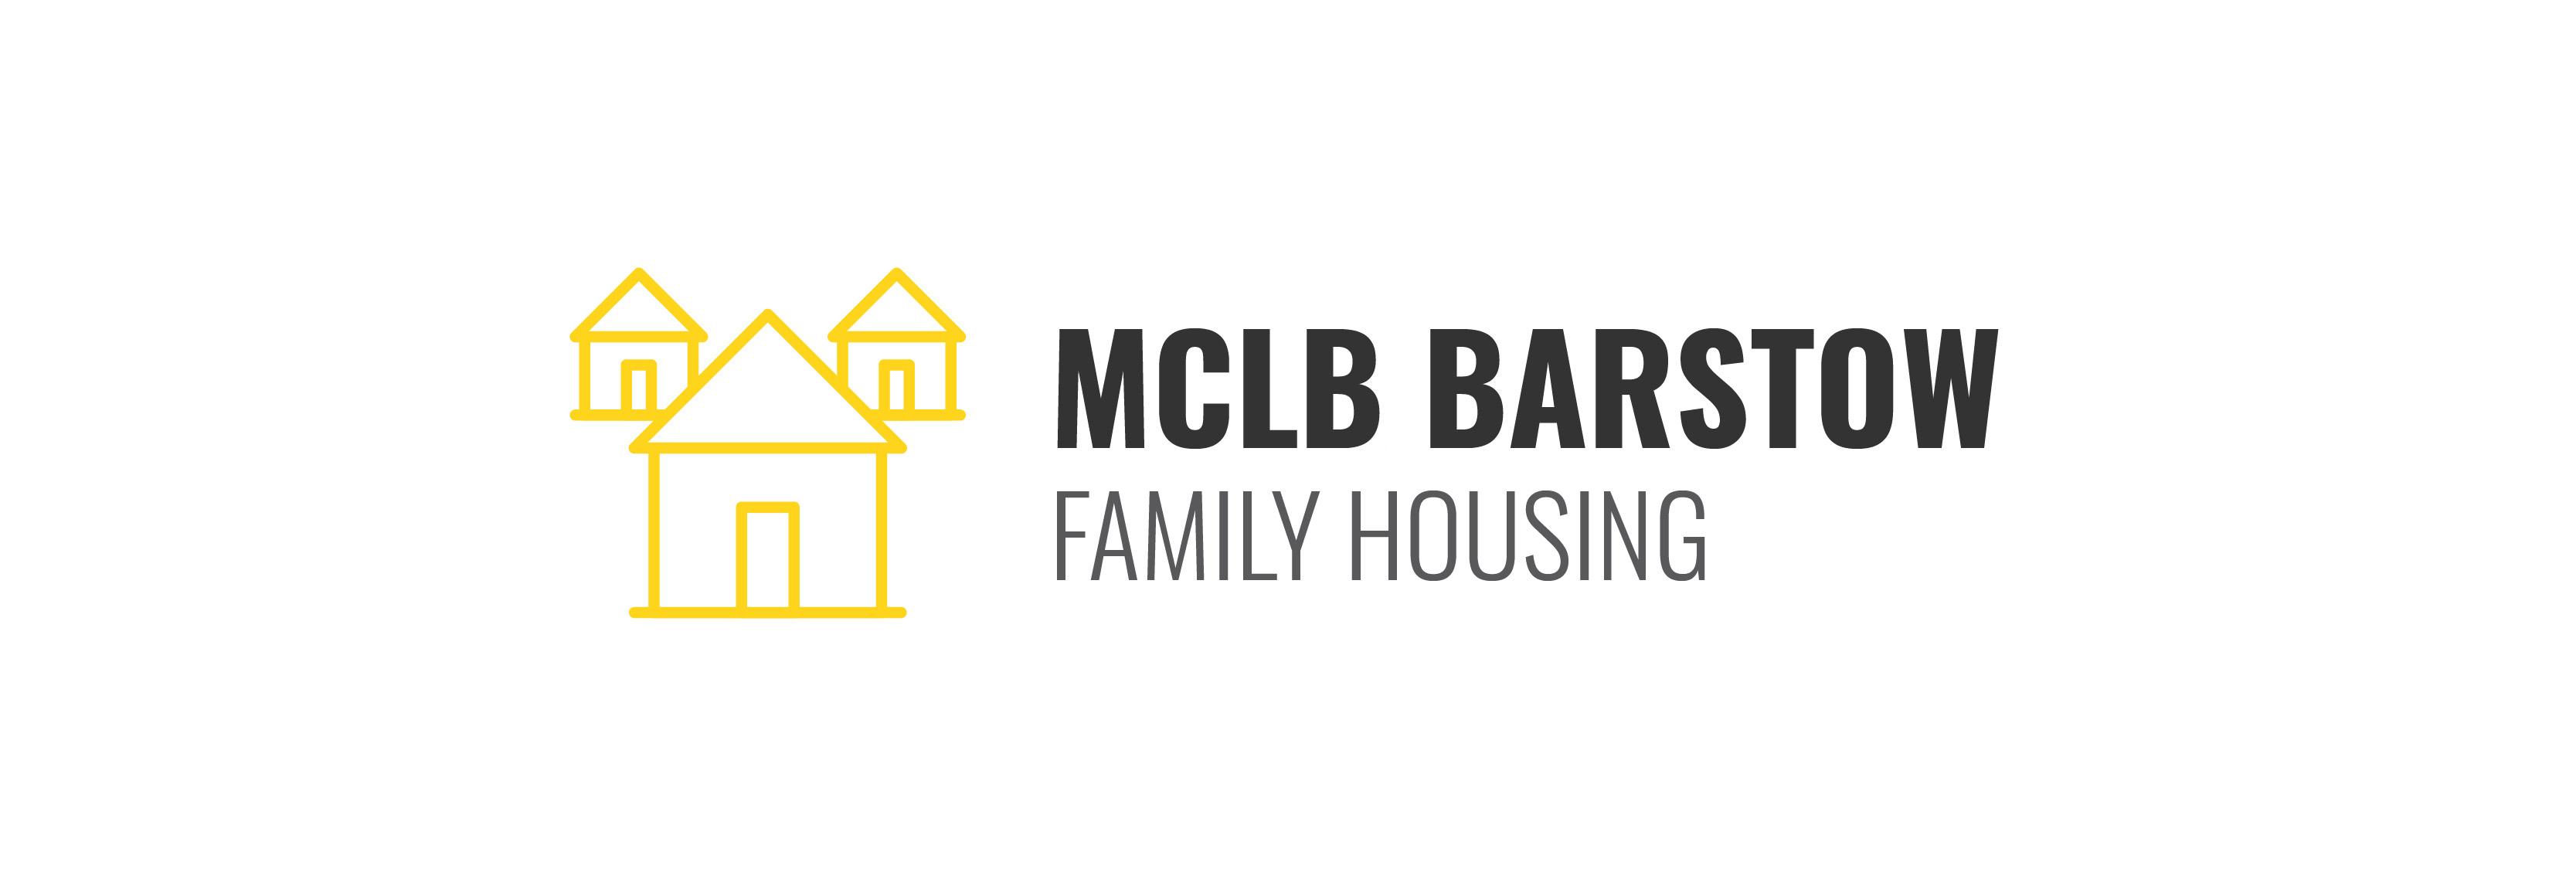 MCLB Barstow Family Housing